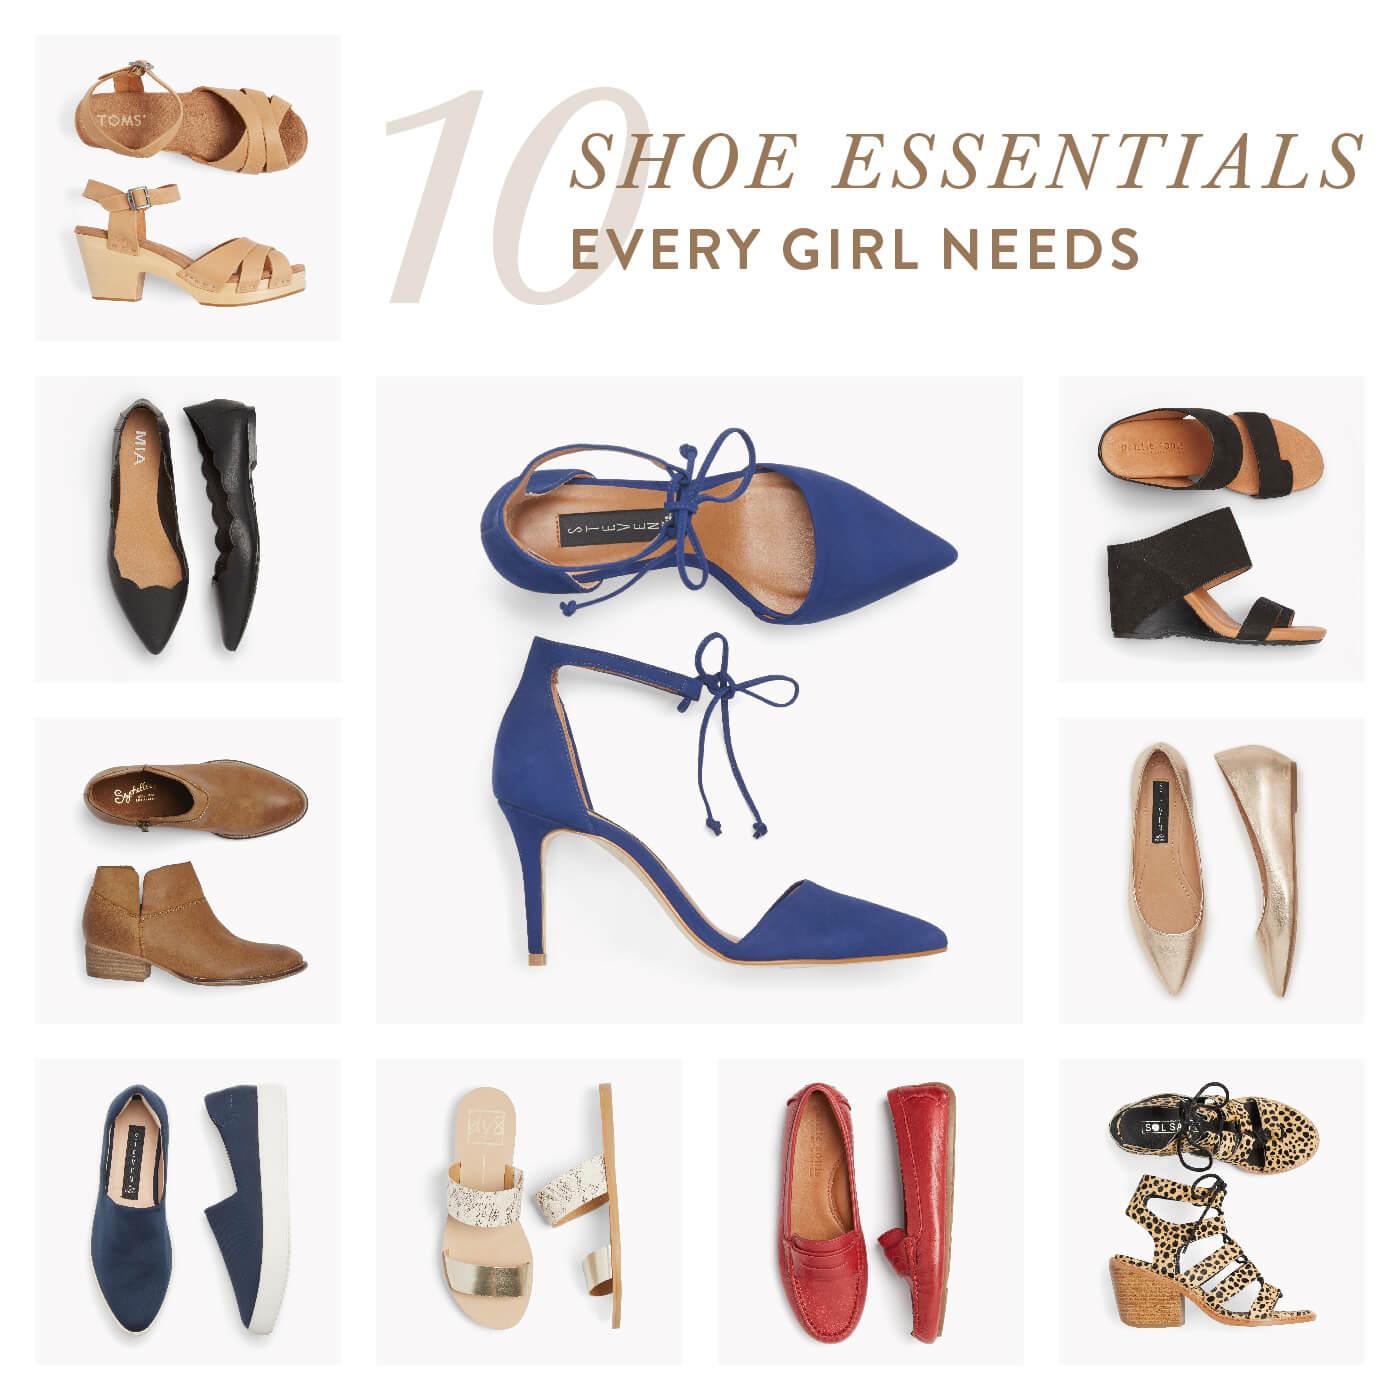 10 Shoe Essentials Every Girl Needs